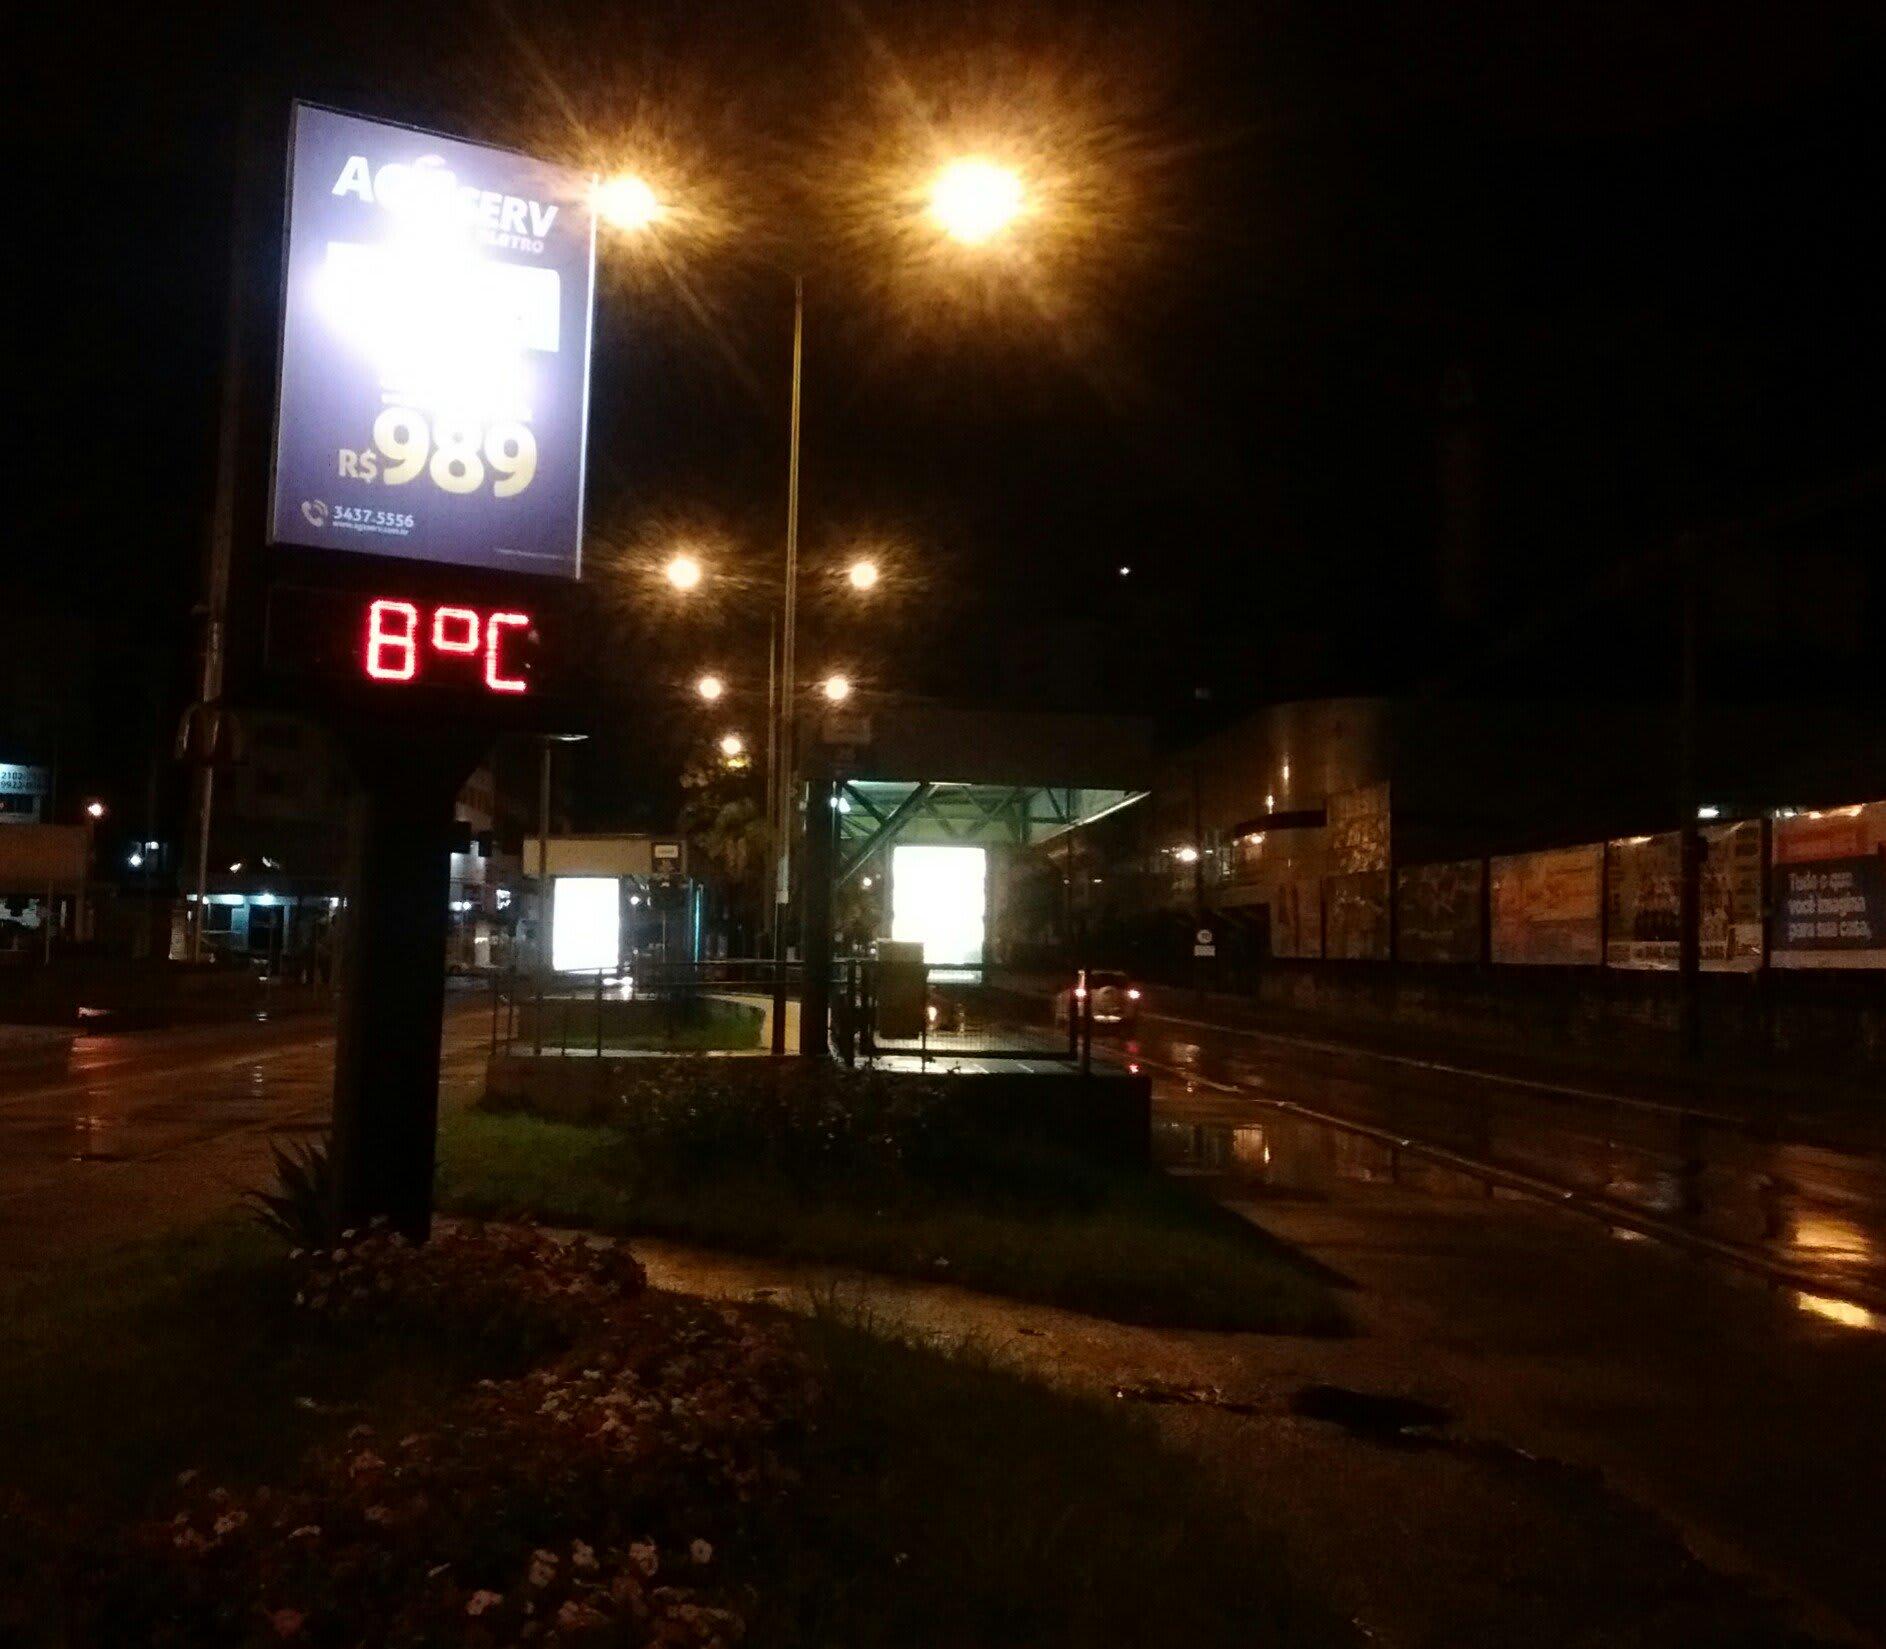 Termômetro de rua apontando 8°C